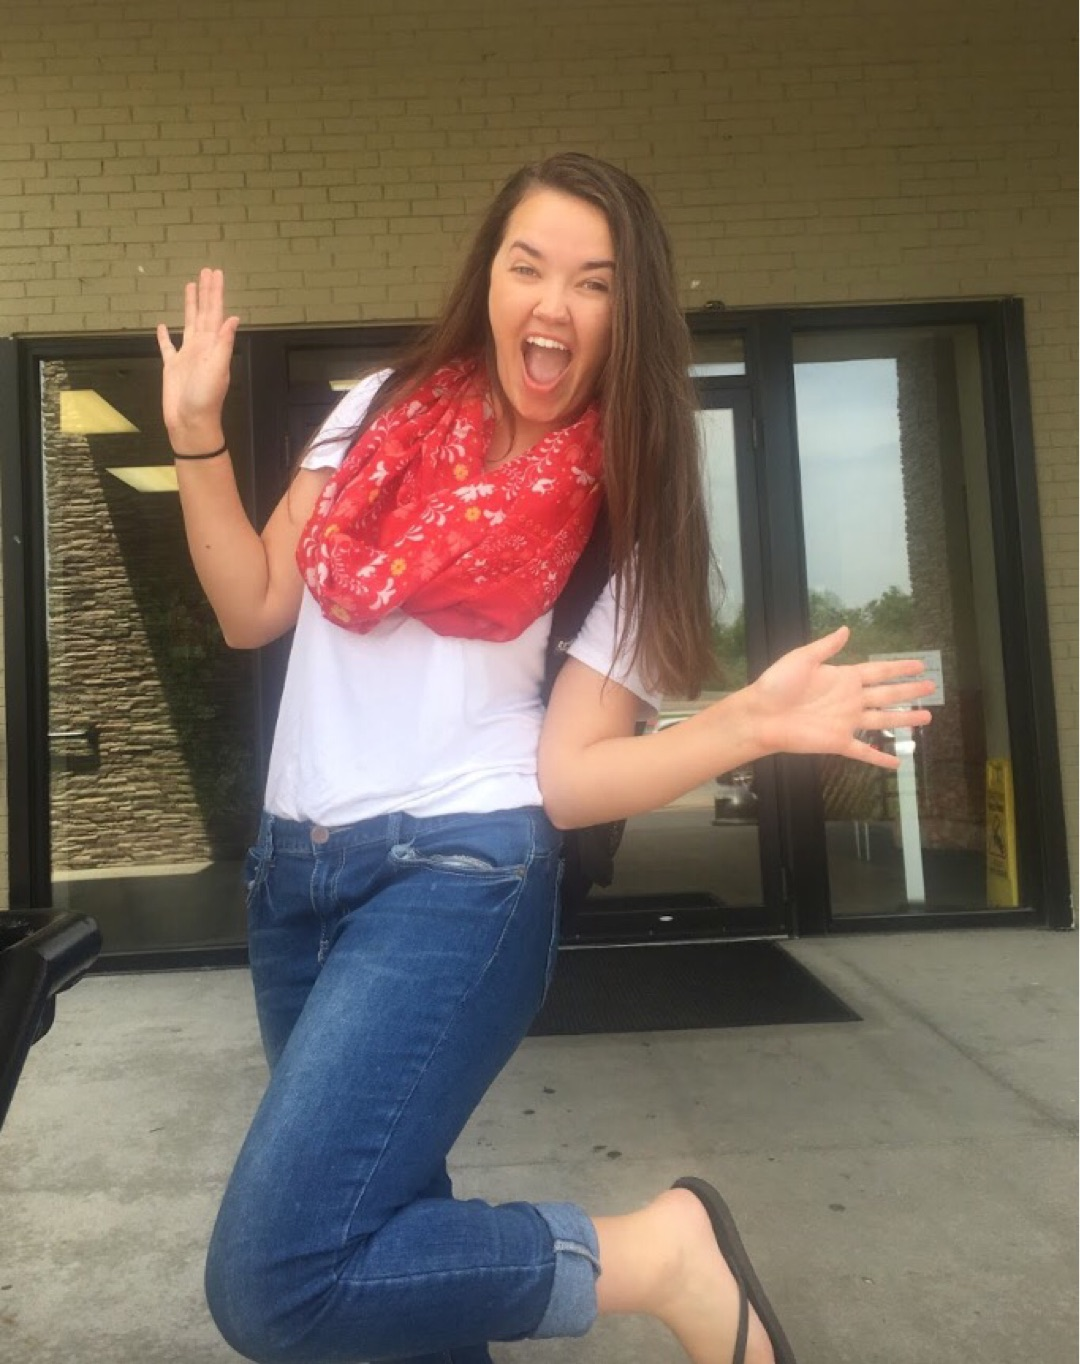 Madison celebrates last day of community college on steps